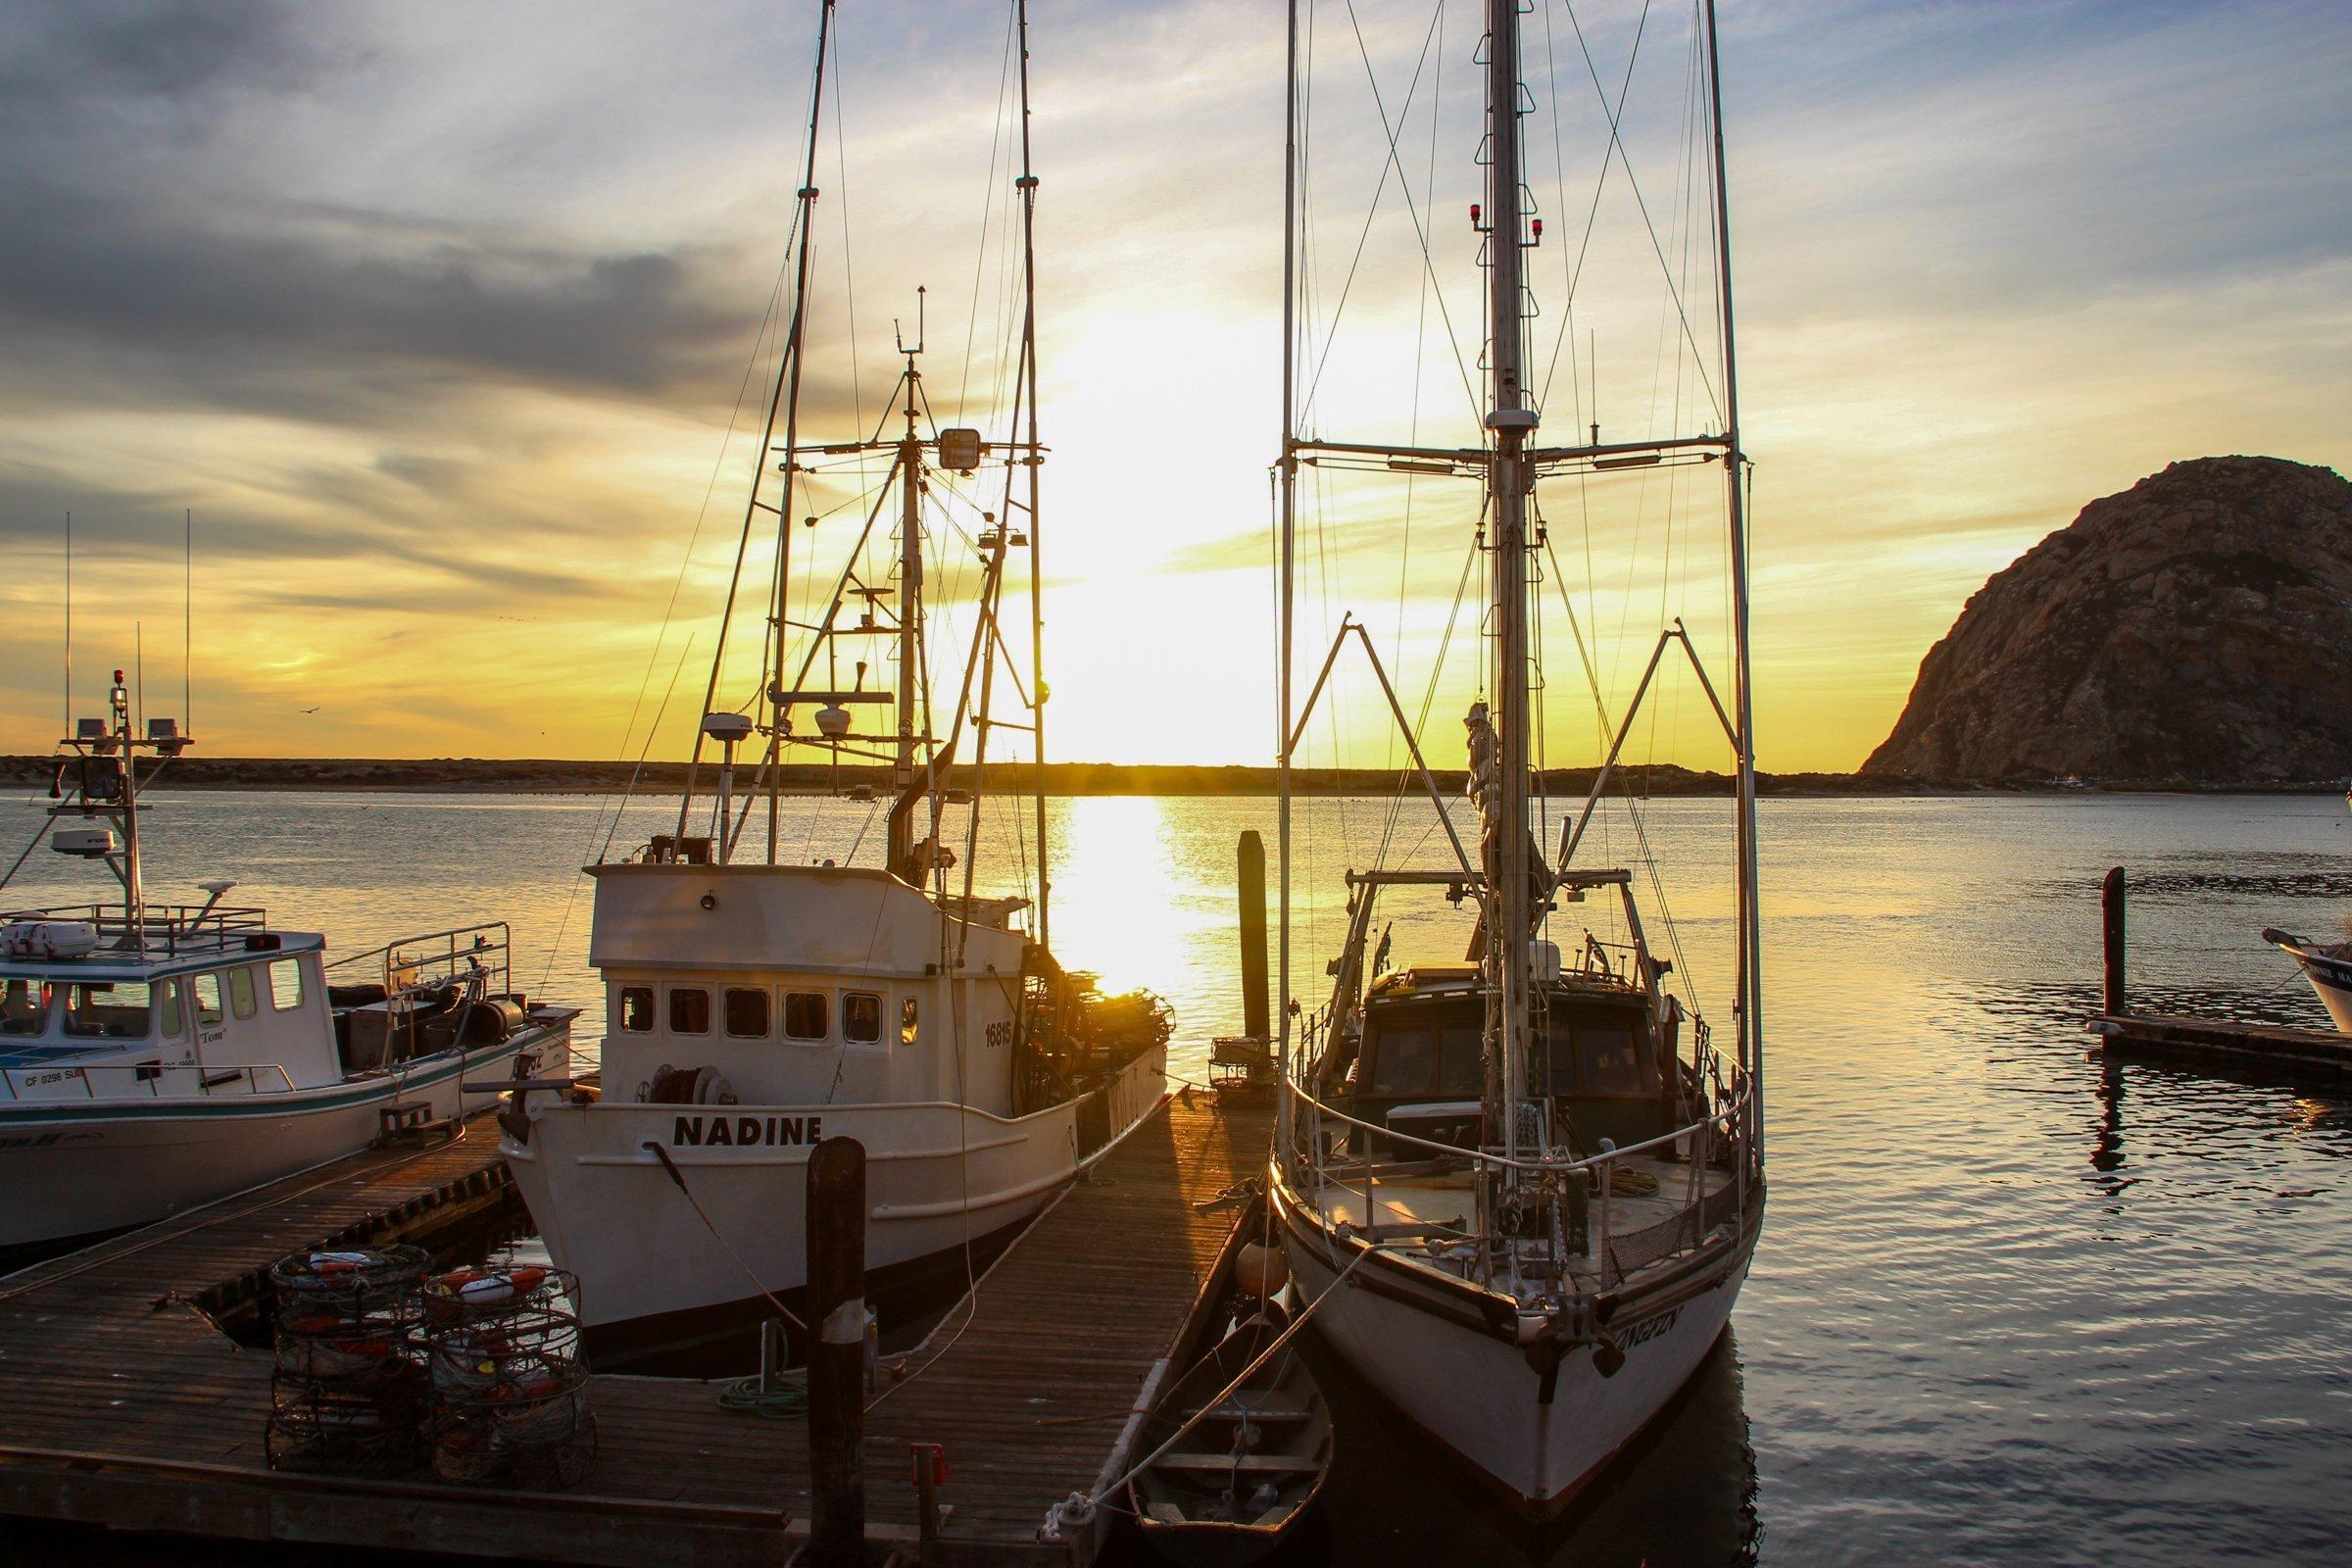 Boats Docked In Morro Bay Harbor